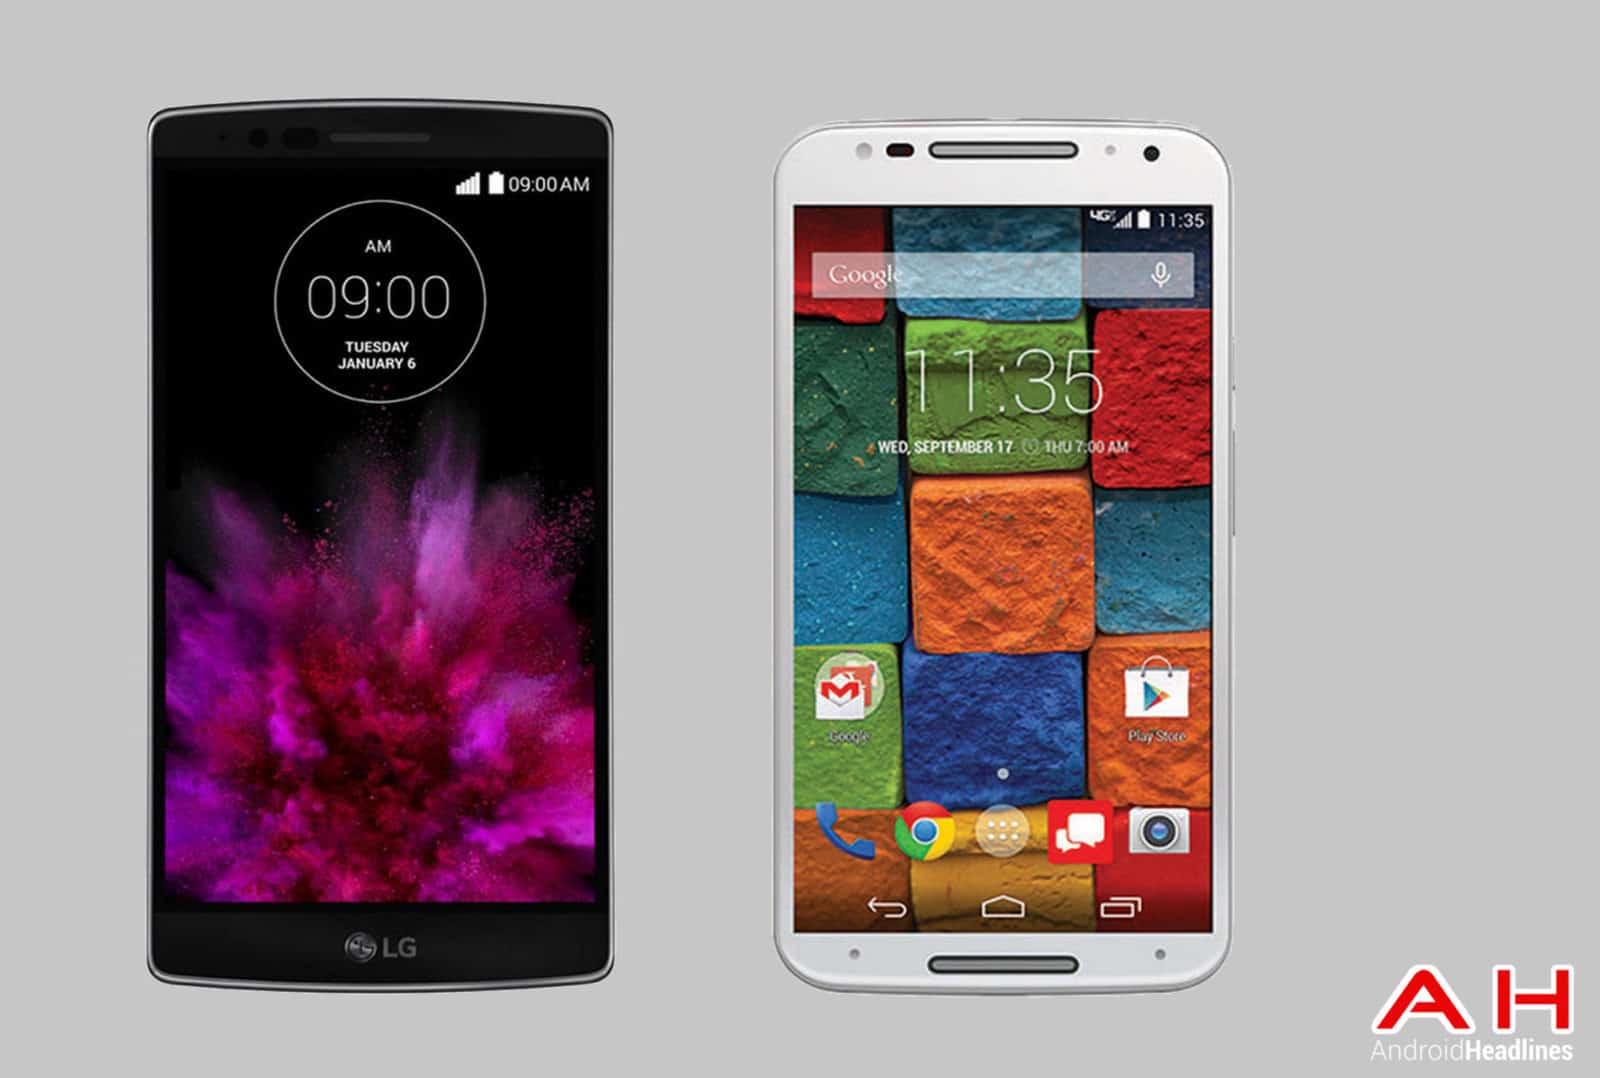 LG G Flex 2 vs Moto X cam AH